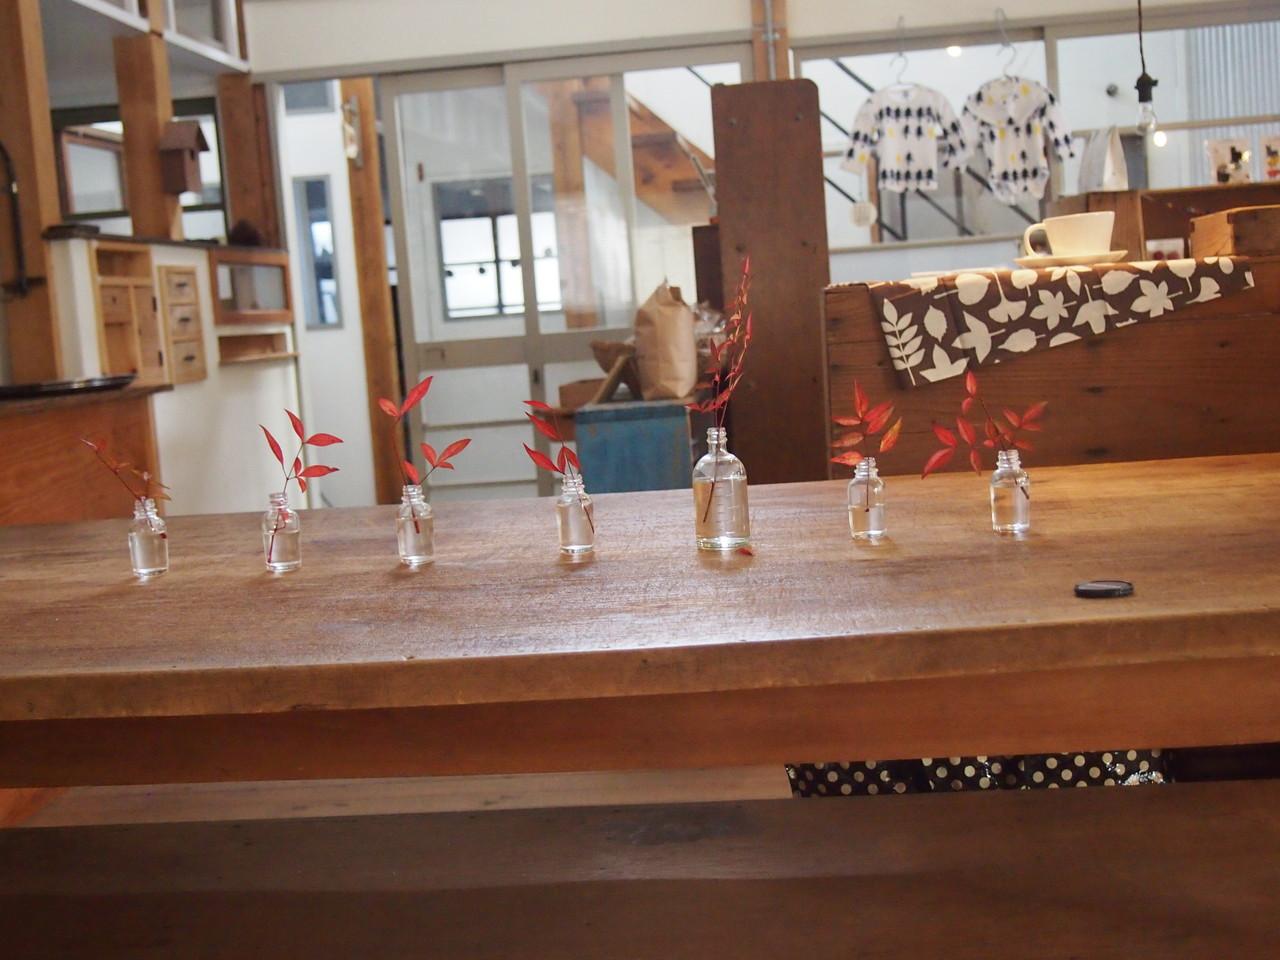 senkiyaさんのお庭をお借りして初イベント開催!素敵なカフェのお隣に雑貨ショップも。